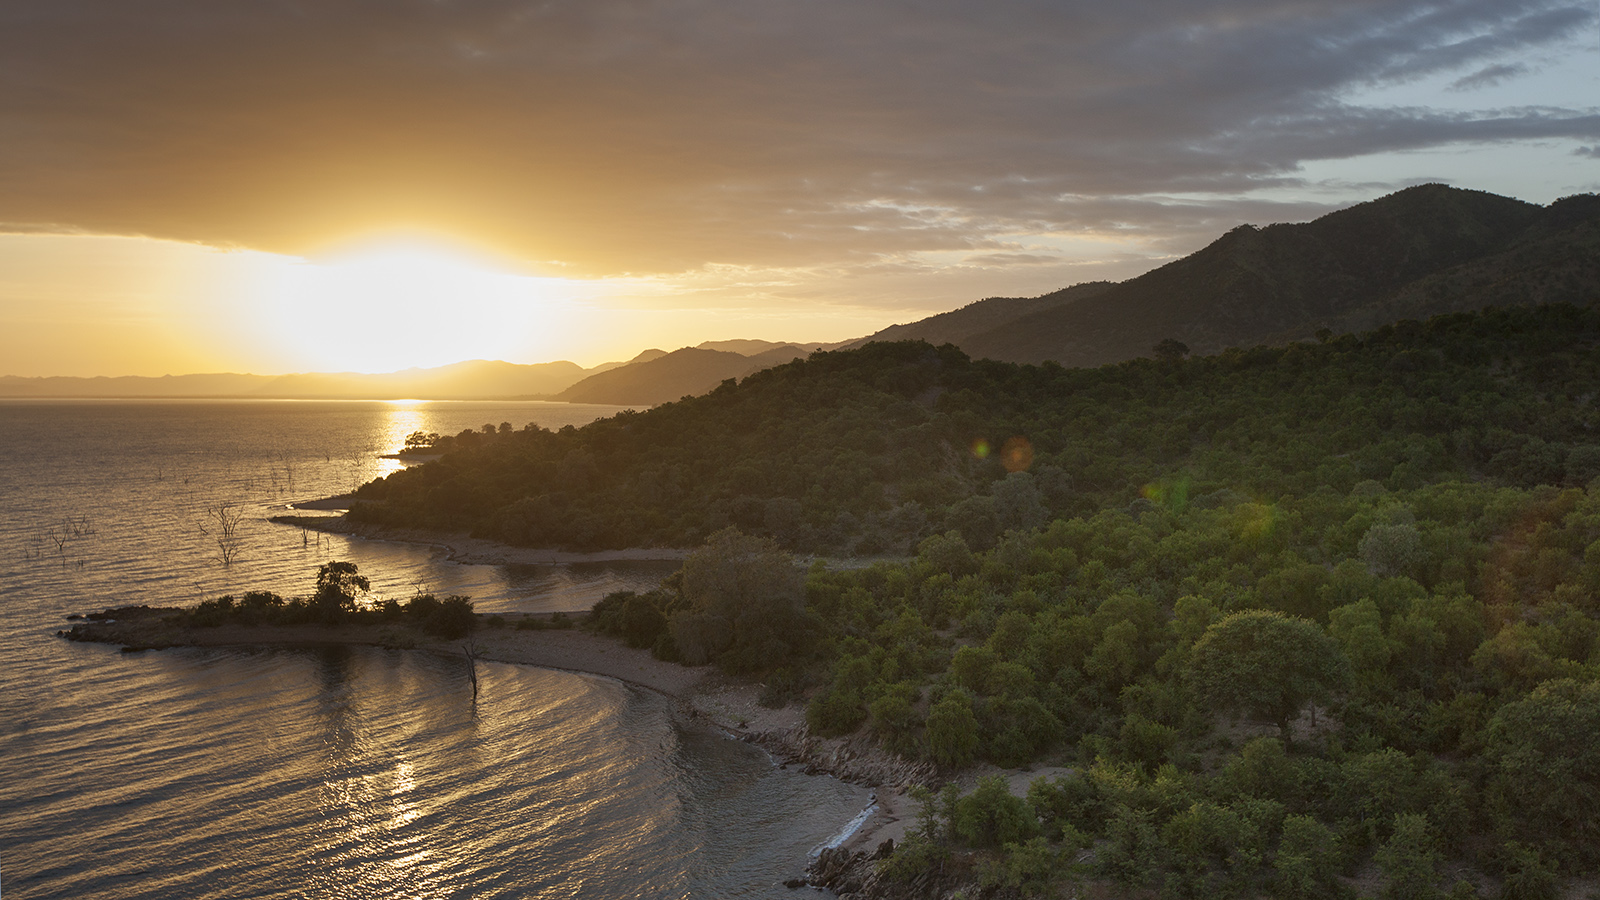 Lake Kariba and Matusadona Mountains - Photo by Rae Kokeš